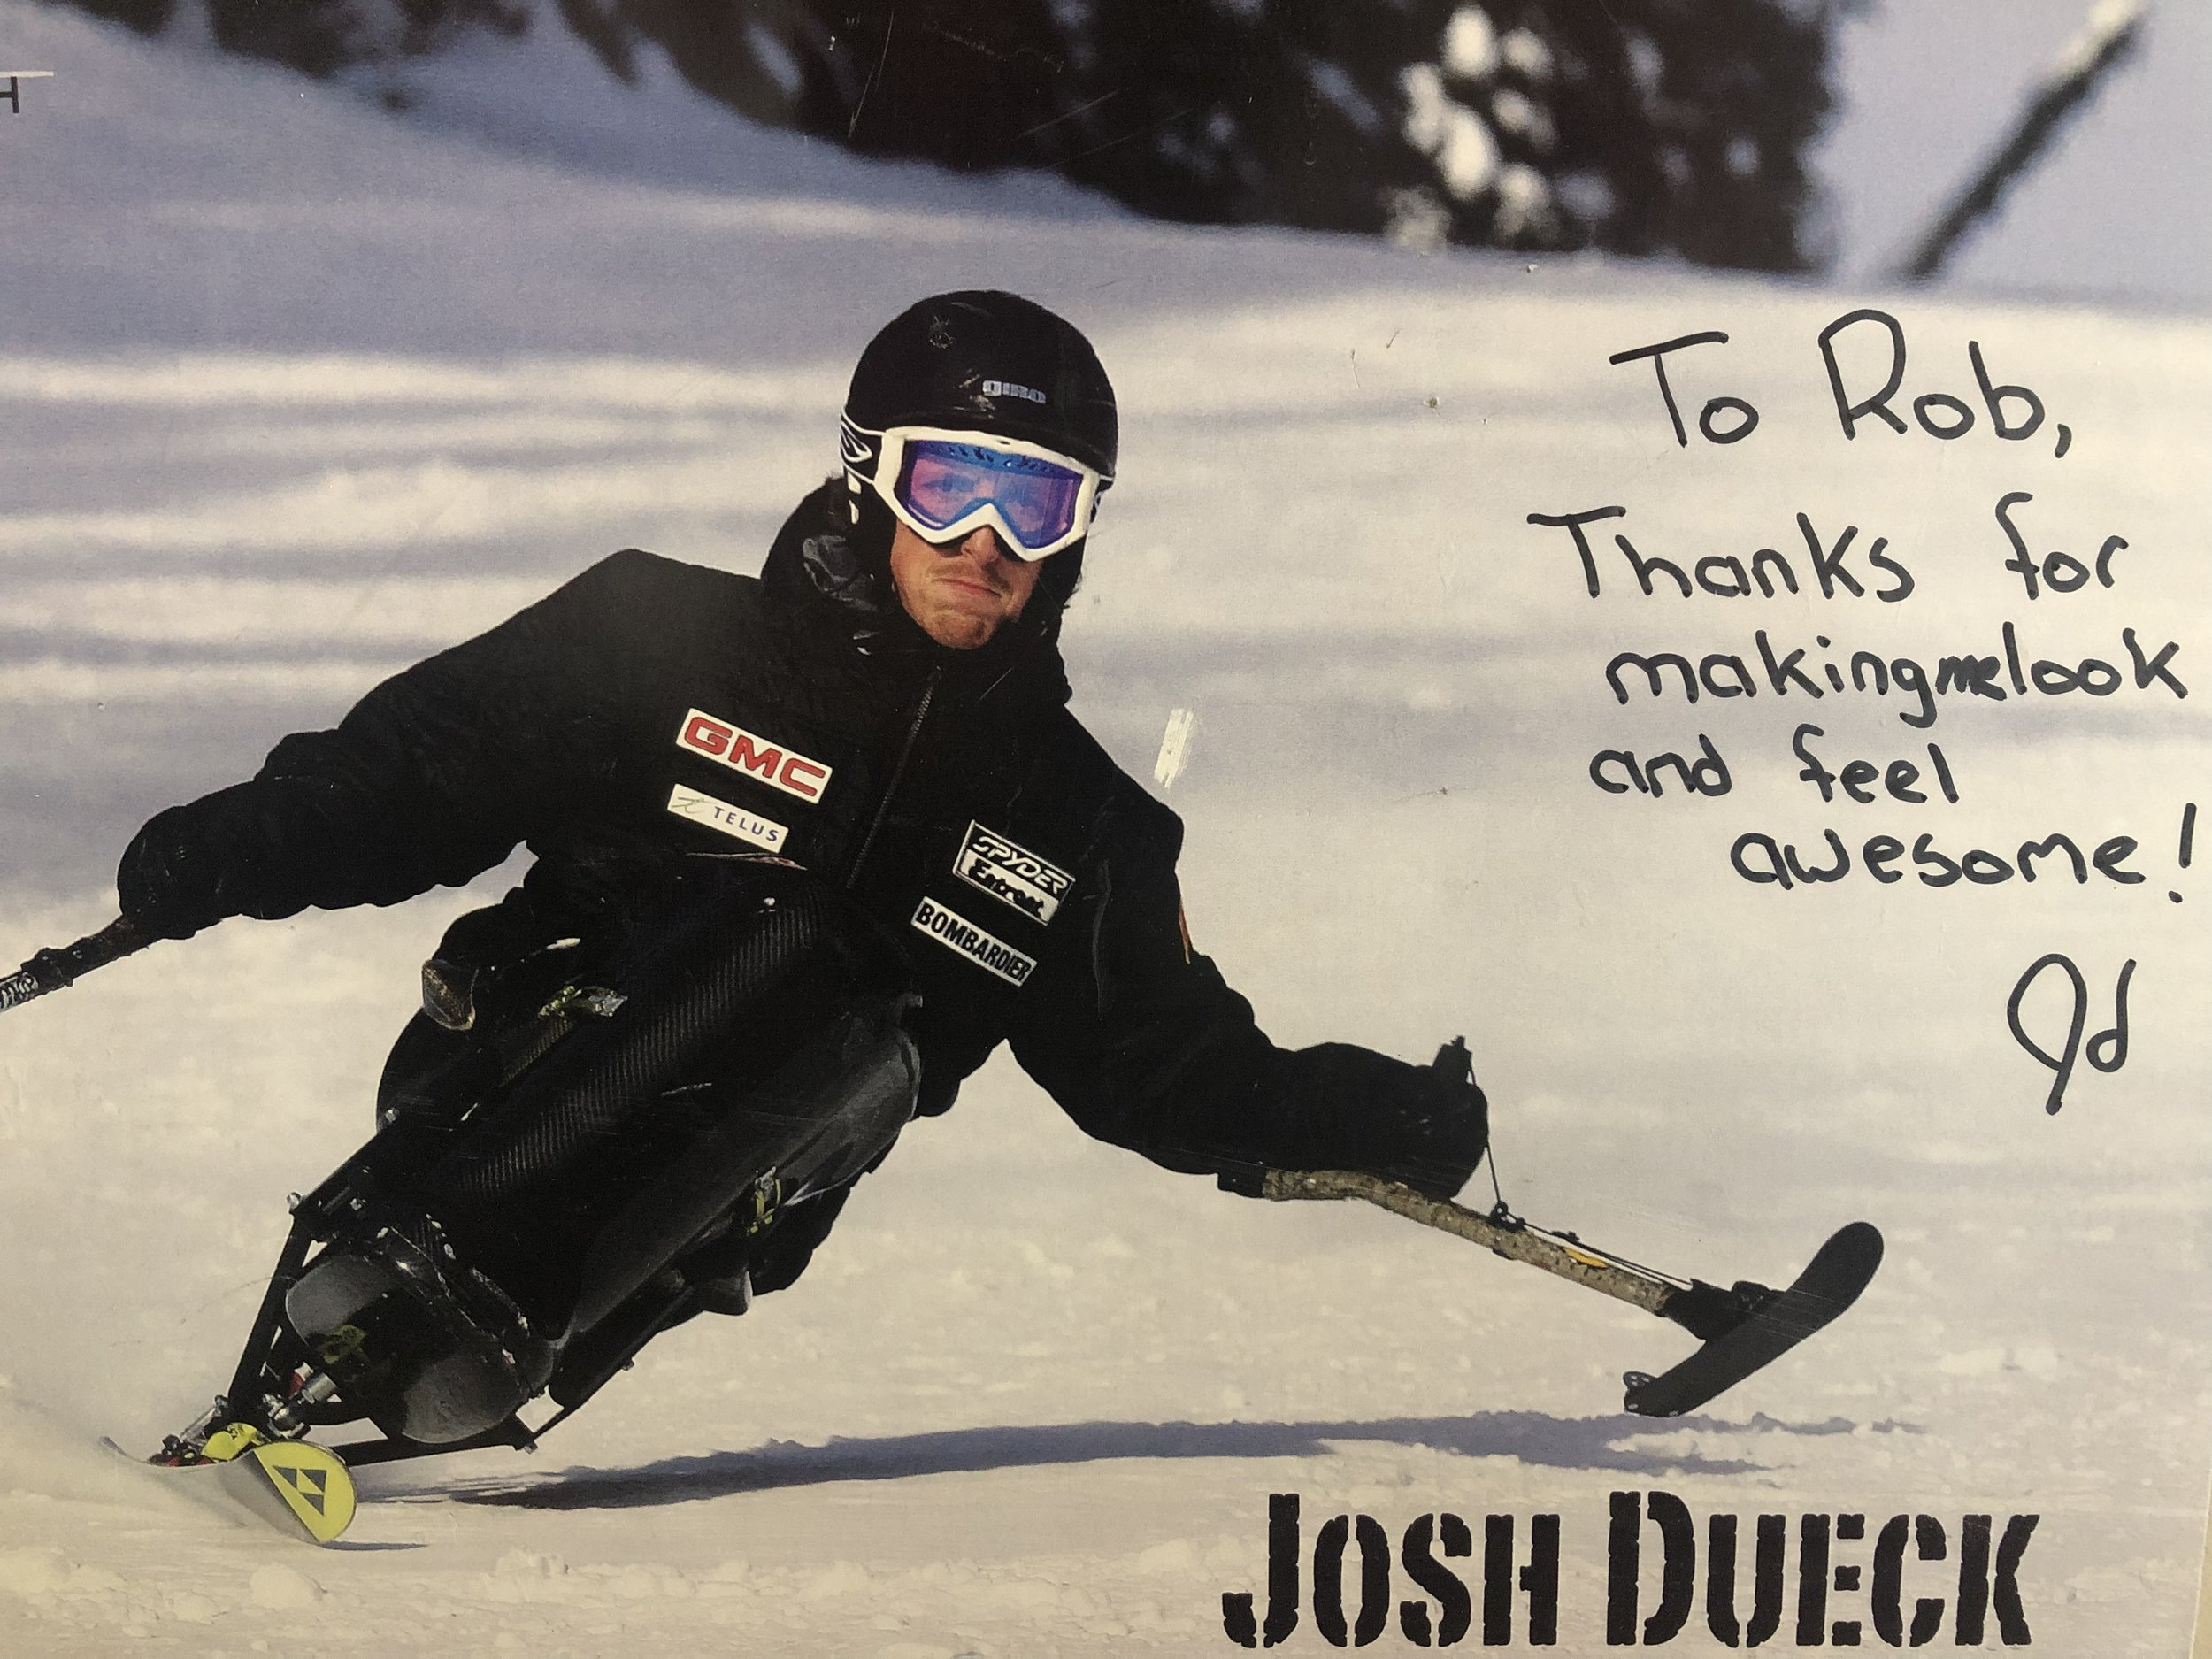 Josh Dueck Thanks